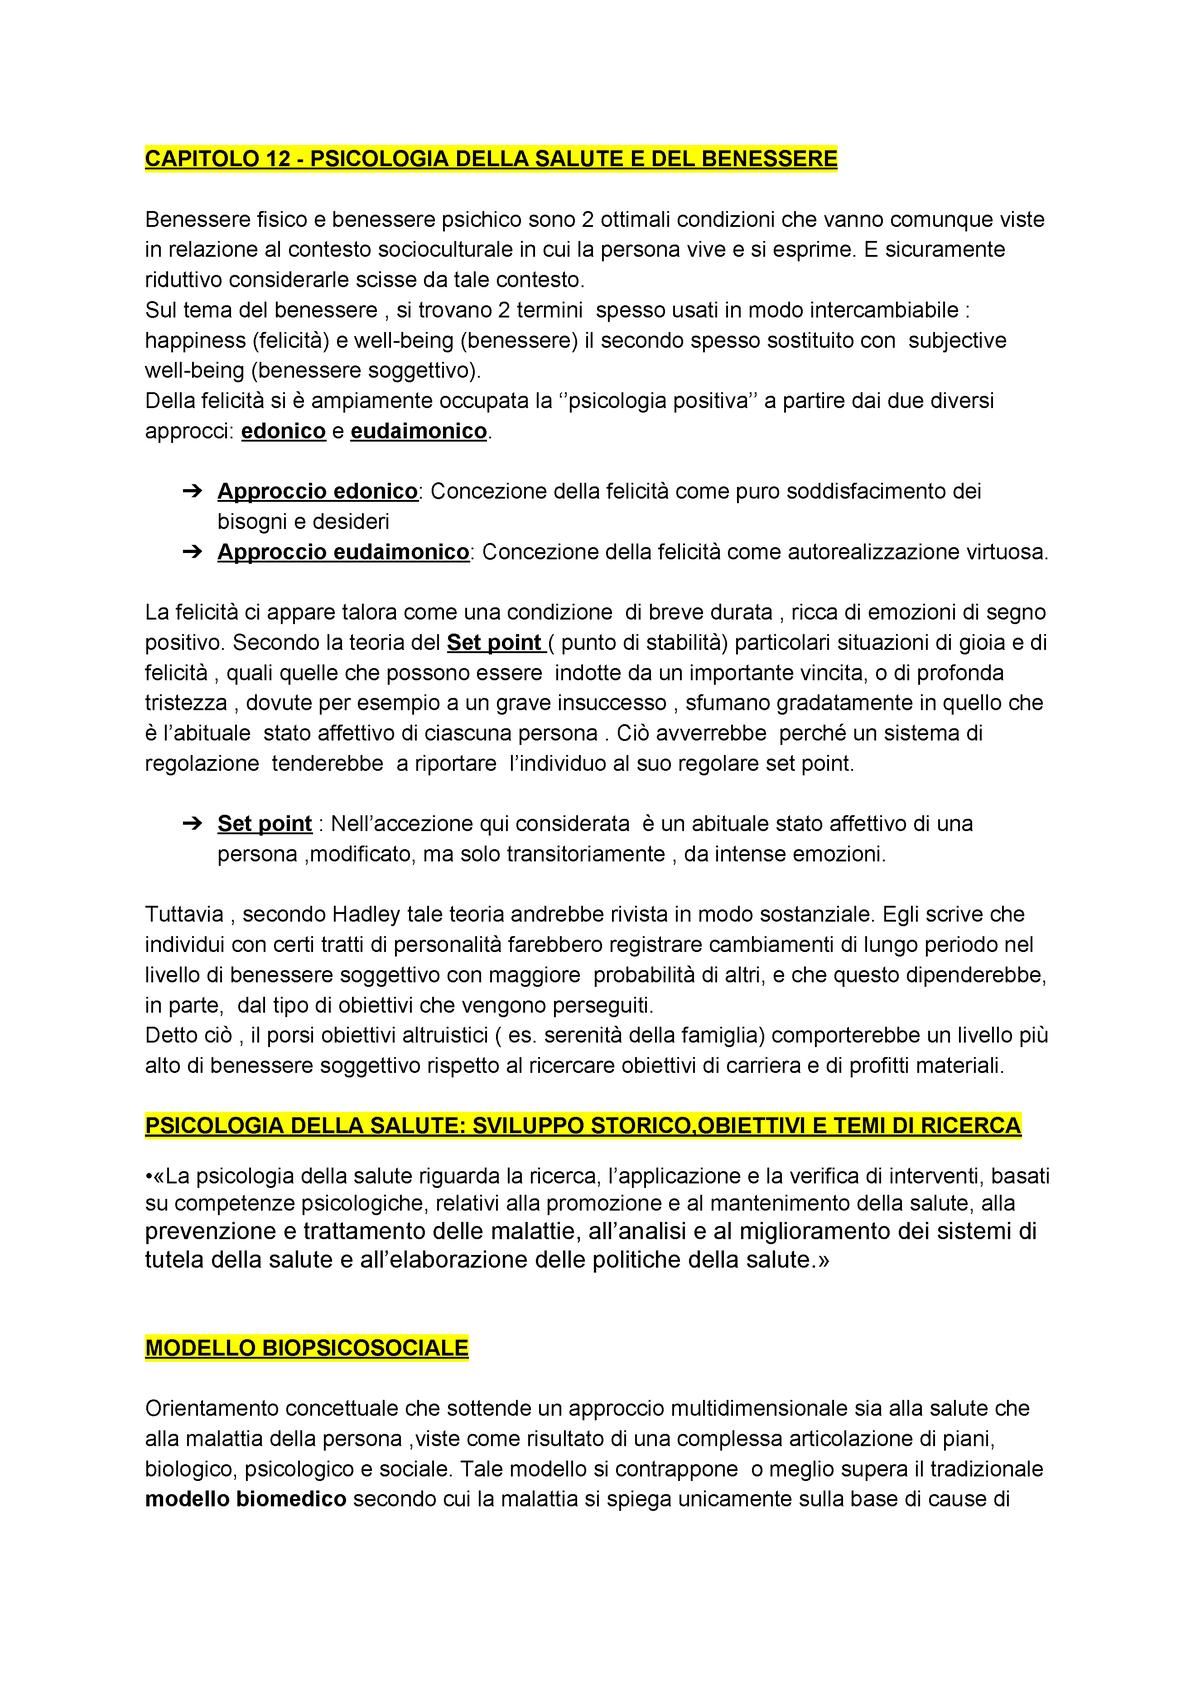 Capitolo 12 Psicologia Generale Unimc Studocu